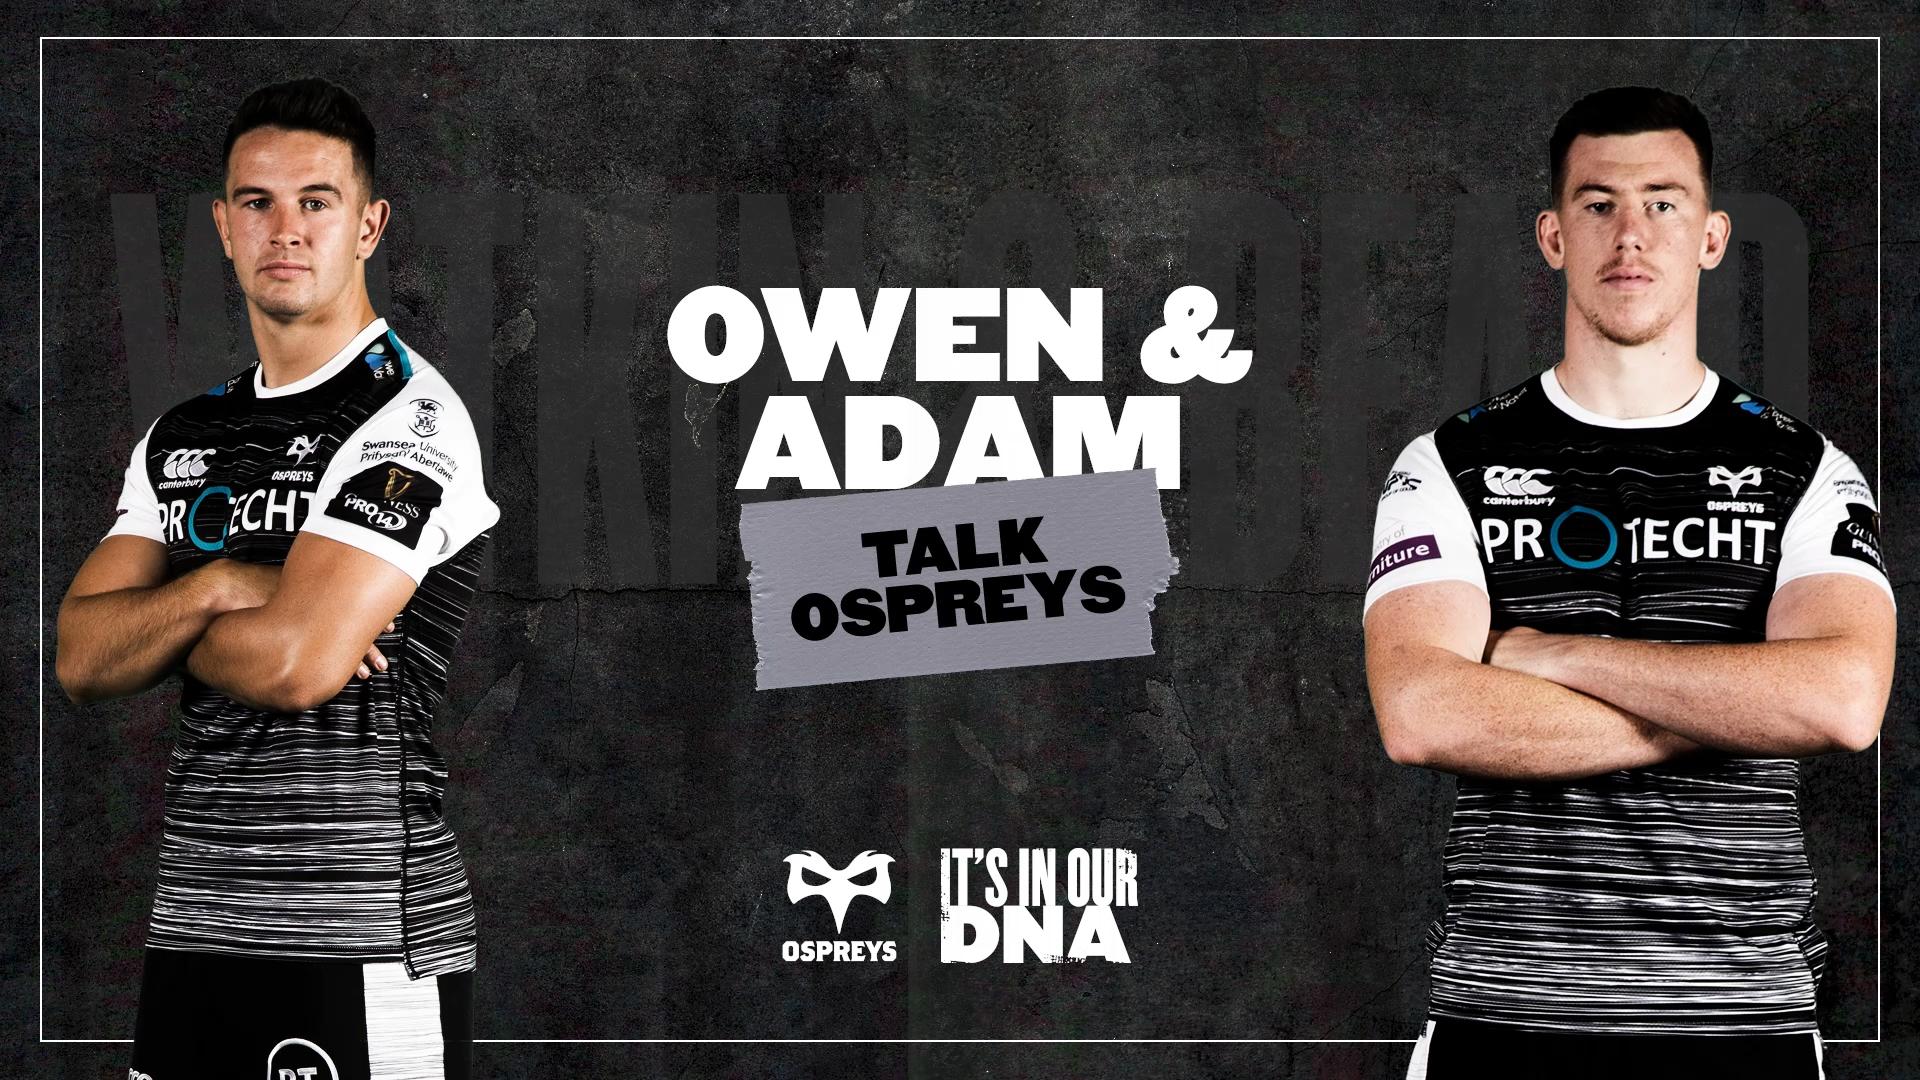 Owen and Adam